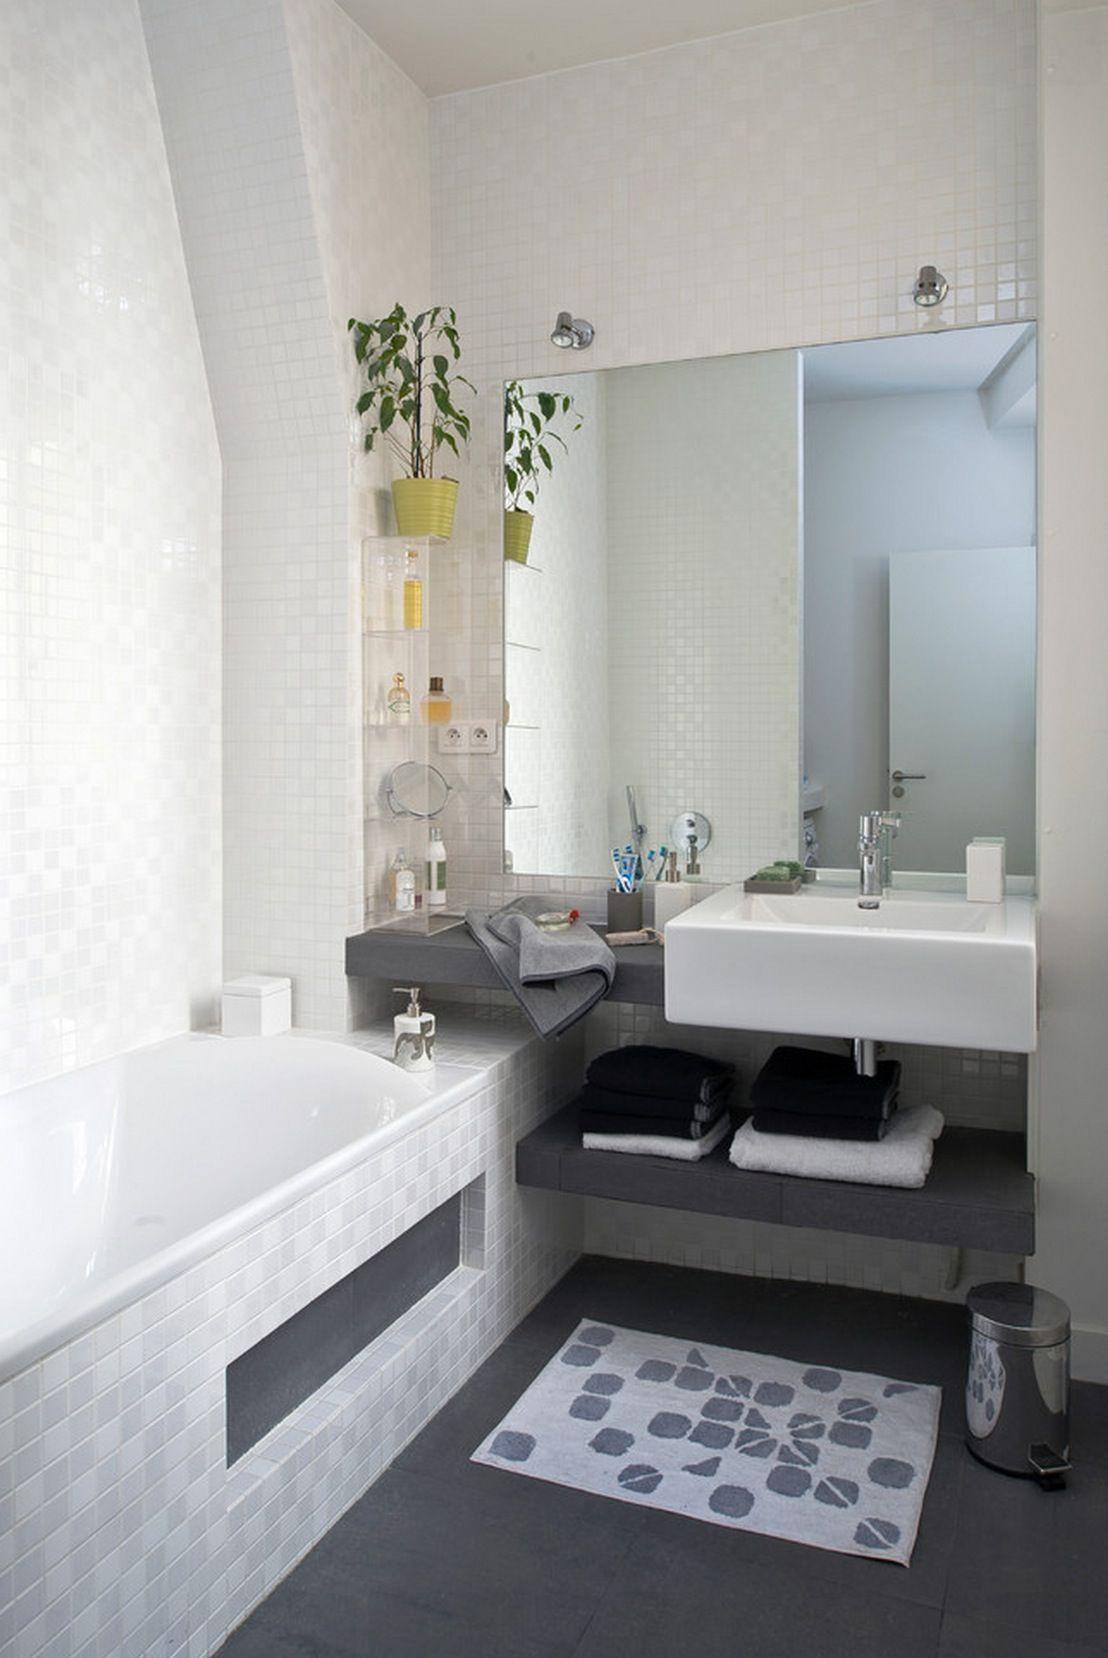 Bathroom Design July 2014 95   Bathroom   Pinterest   Bathroom designs